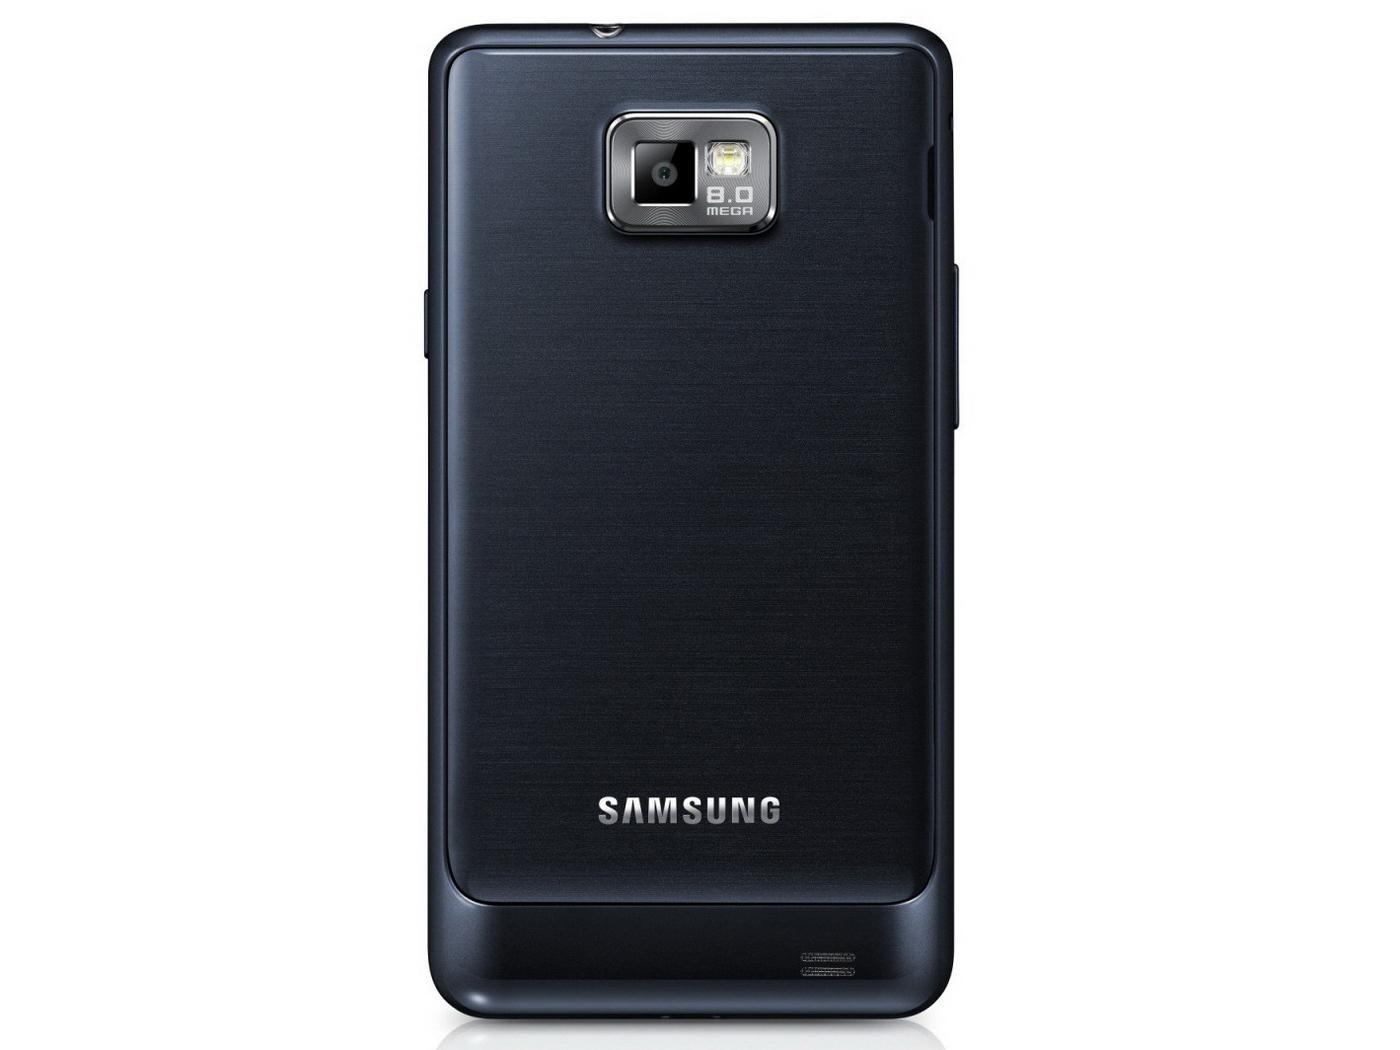 Смартфон Galaxy S2 Plus от Samsung - Notebookcheck-ru.com